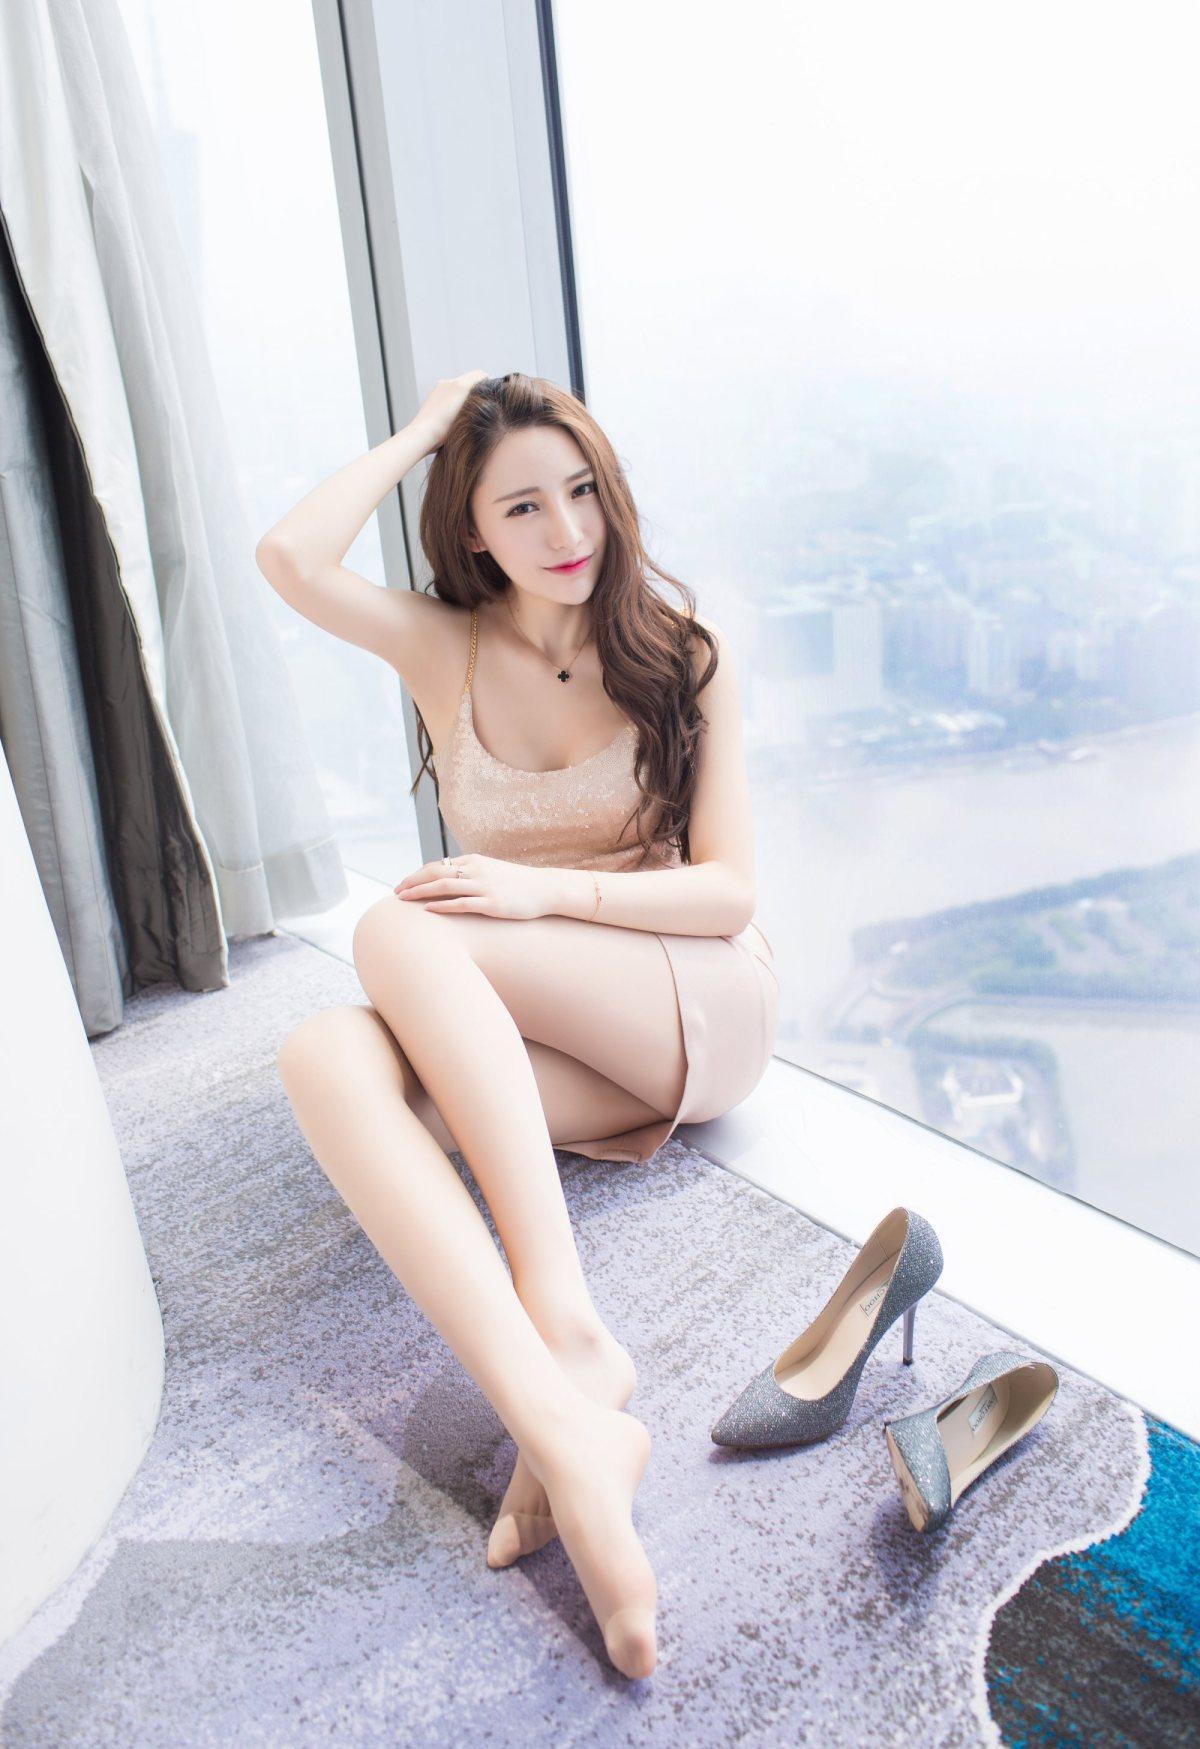 4SSNI-174好看的韩国美女